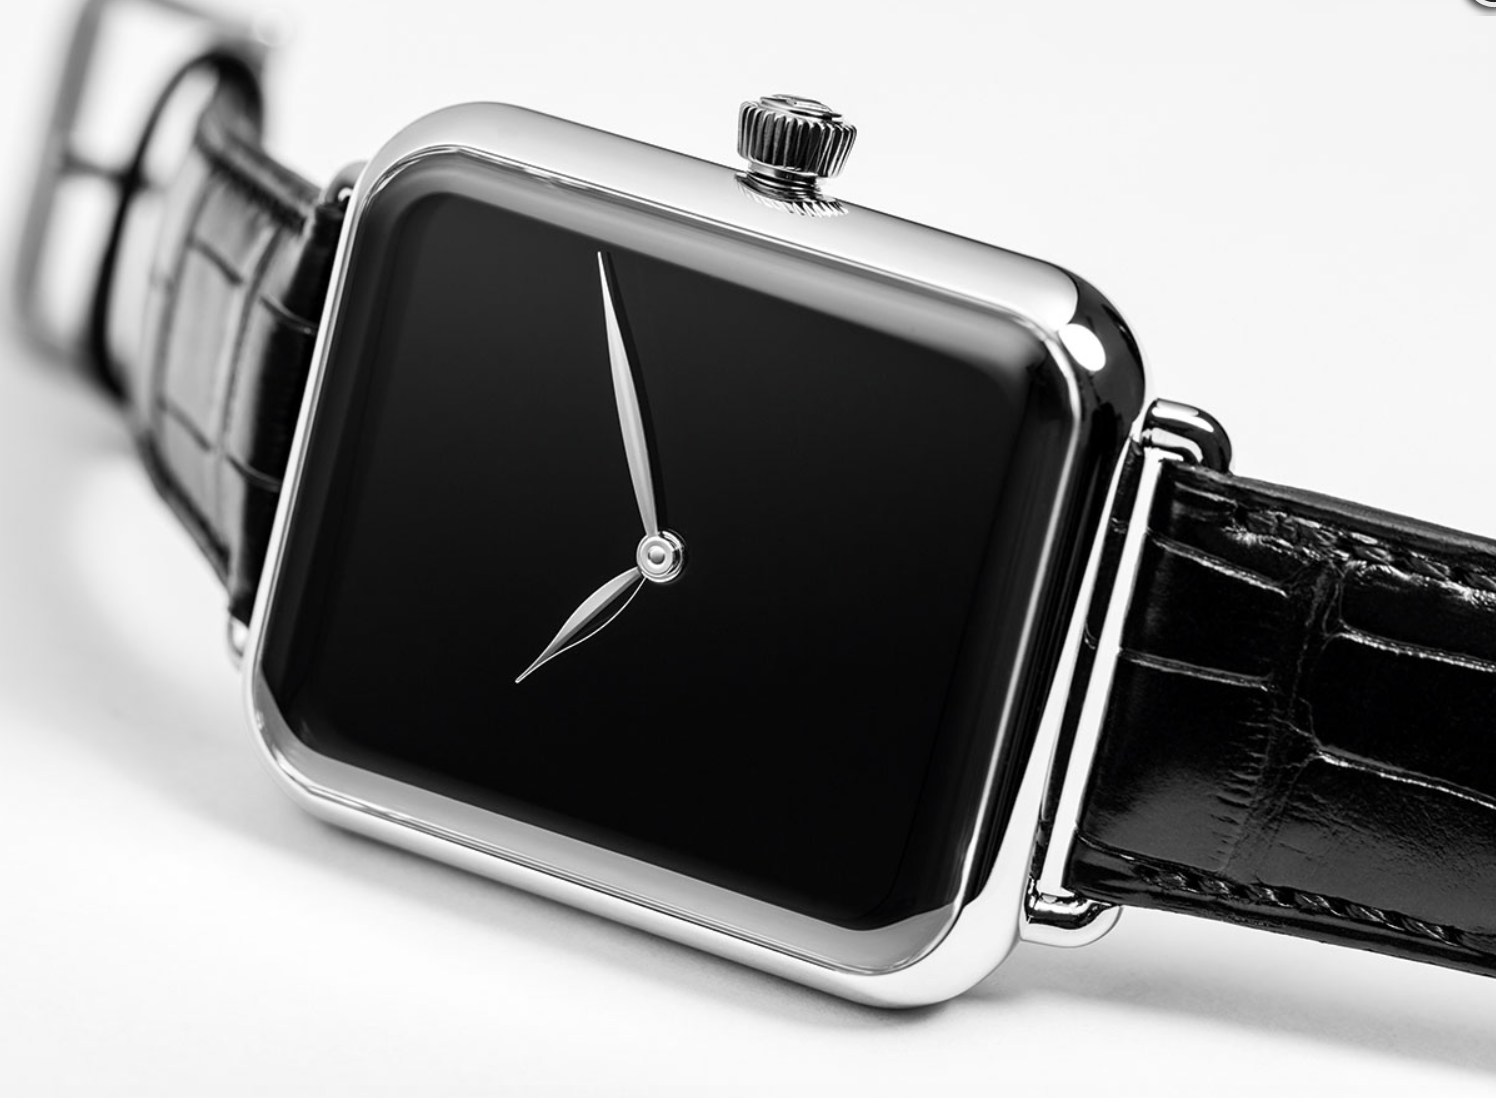 Swiss Alp Watch Zzzz Resembles Apple Watch at First Glance